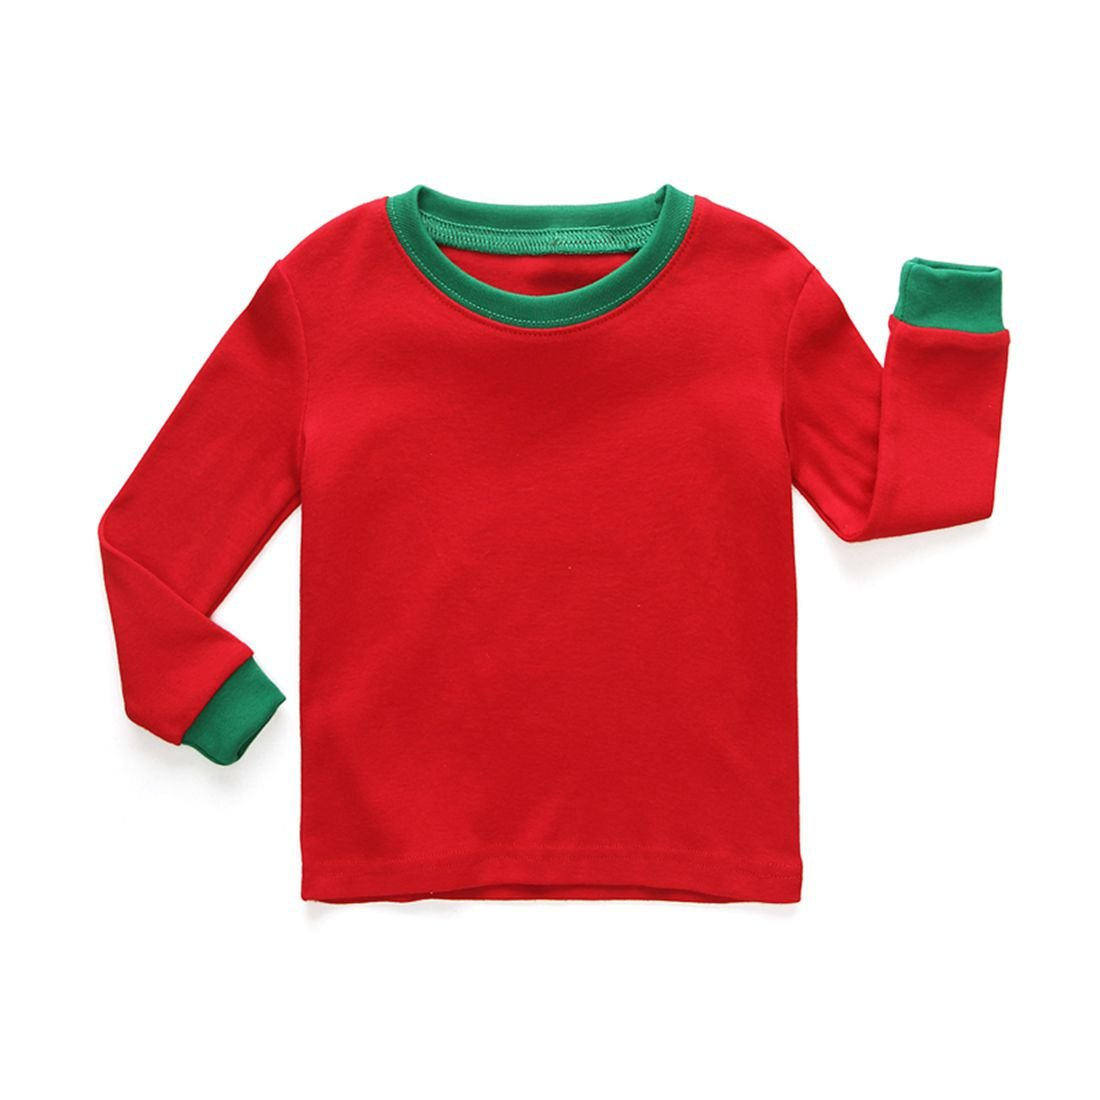 Girls Pajamas Easy Long Sleeves Toddler Bright Stripe Kids Pjs Sleepwear 2 Piece